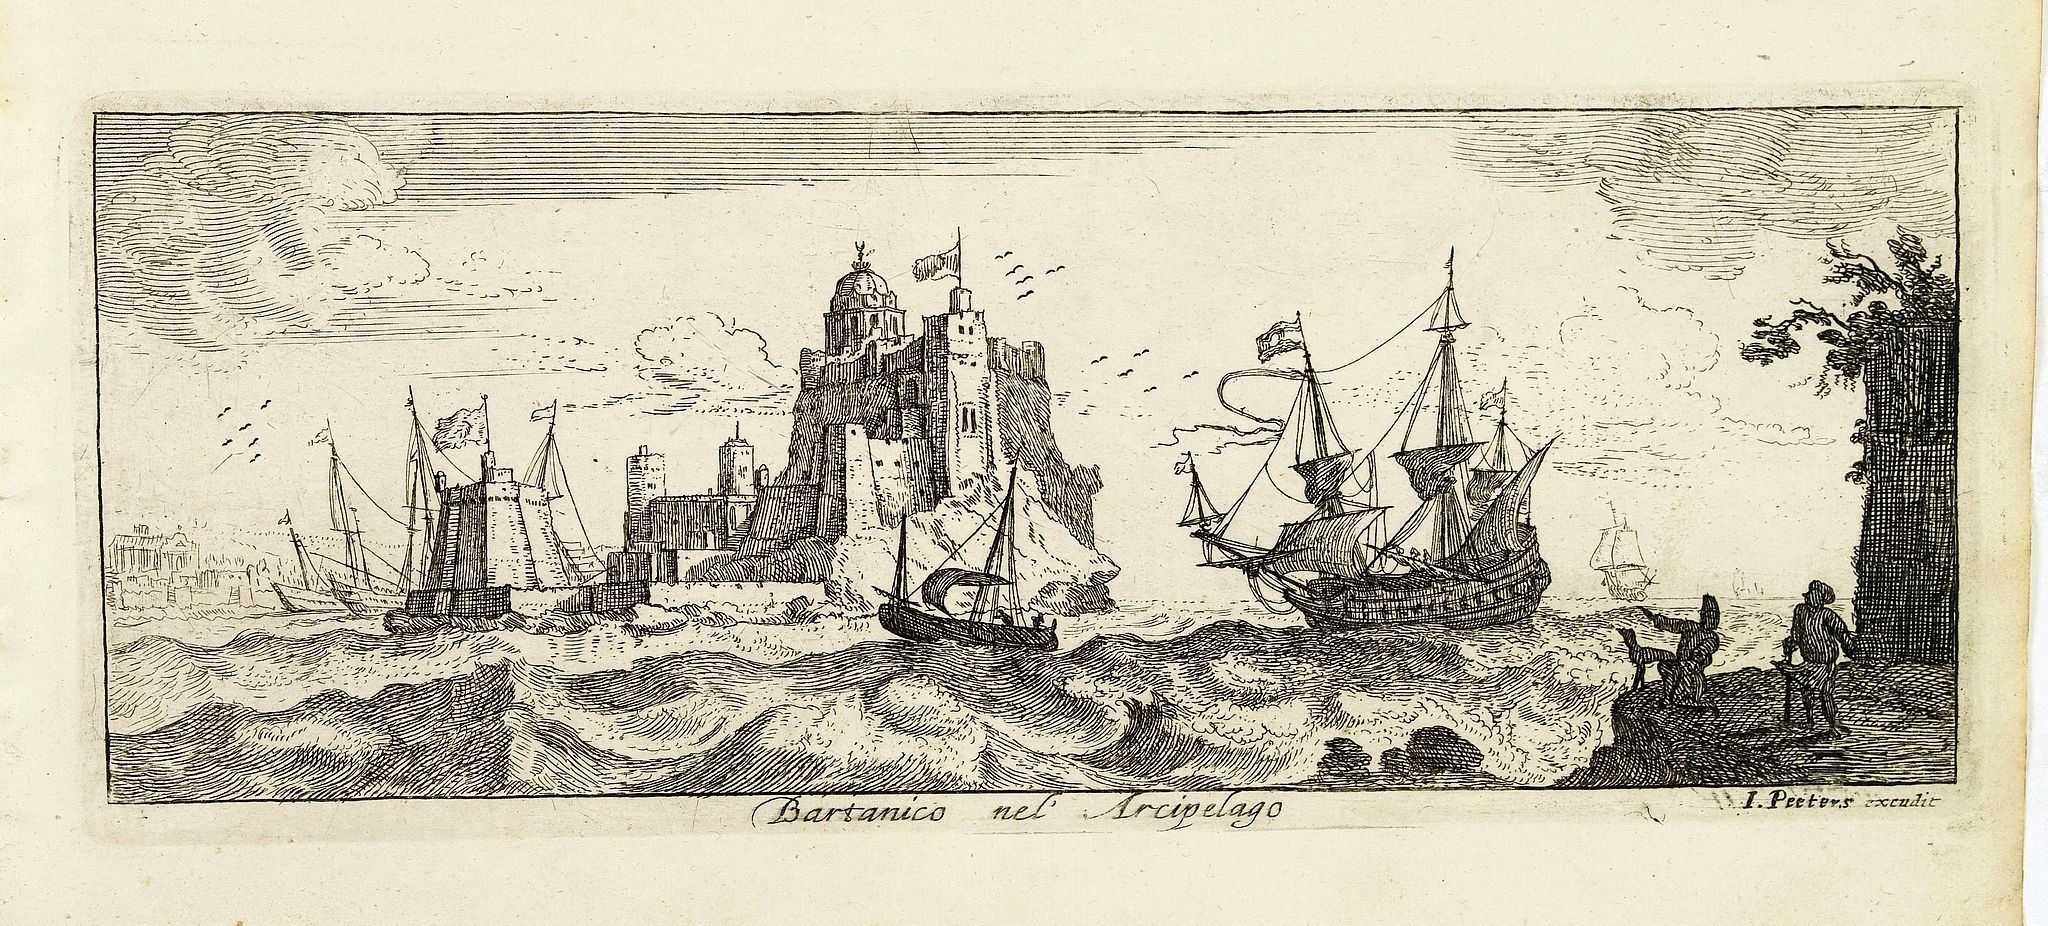 PEETERS, J. / VOSTERMANS II, L. -  Bartanico nel Arcipelago. (Bartanico)